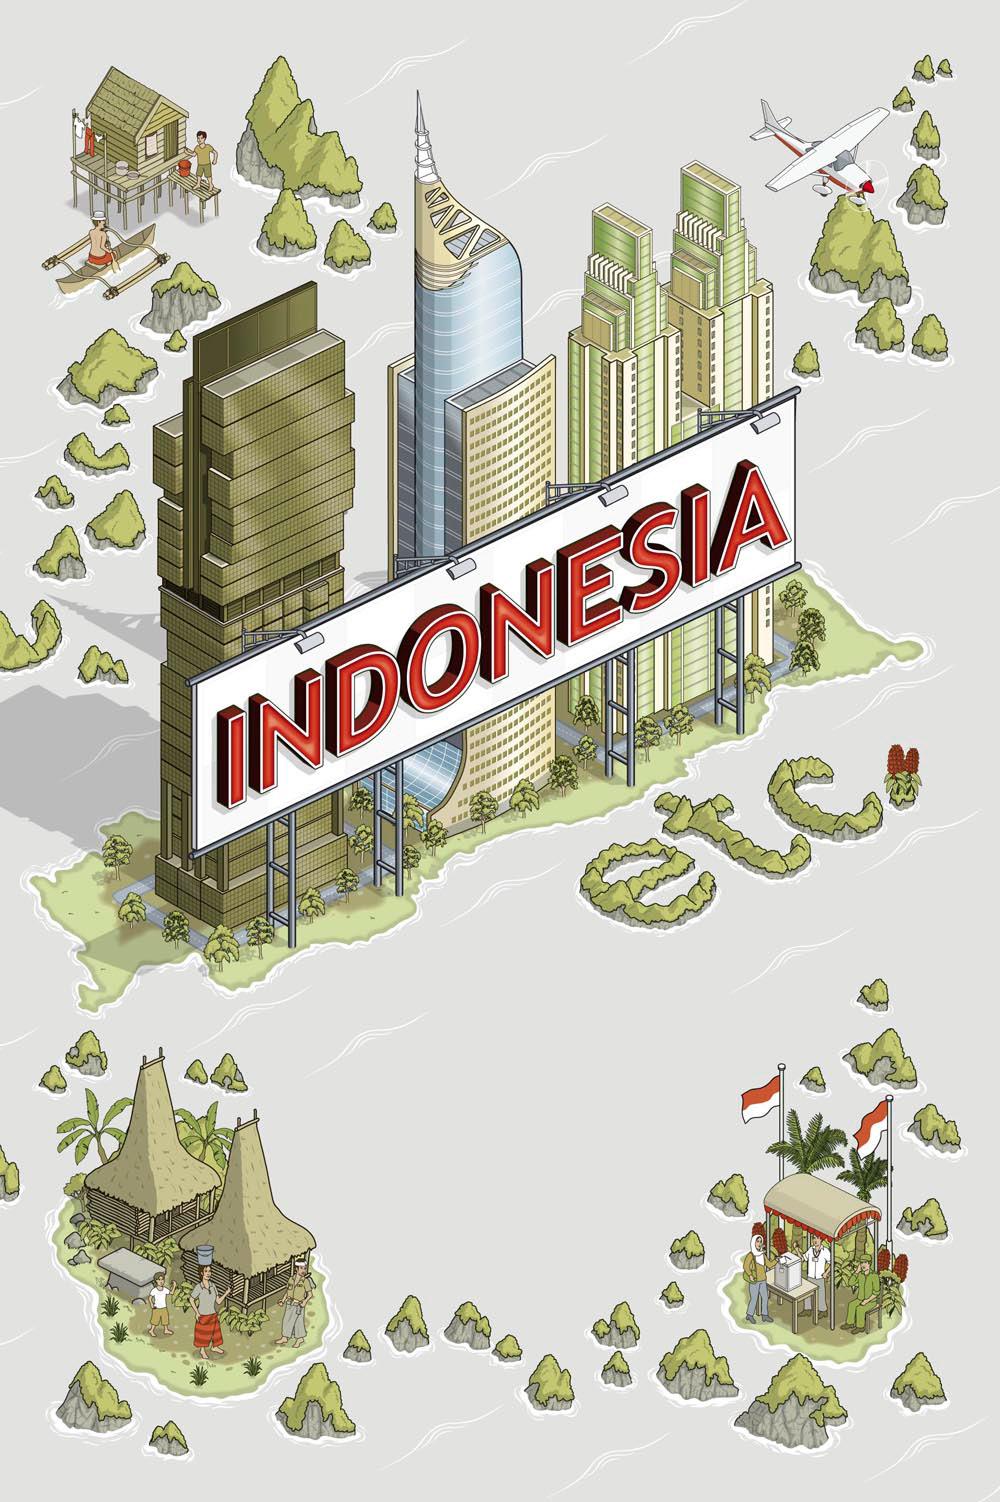 rod hunt illustration studio illustration and map design portfolios for advertising design digital media and publishing indonesia etc book cover